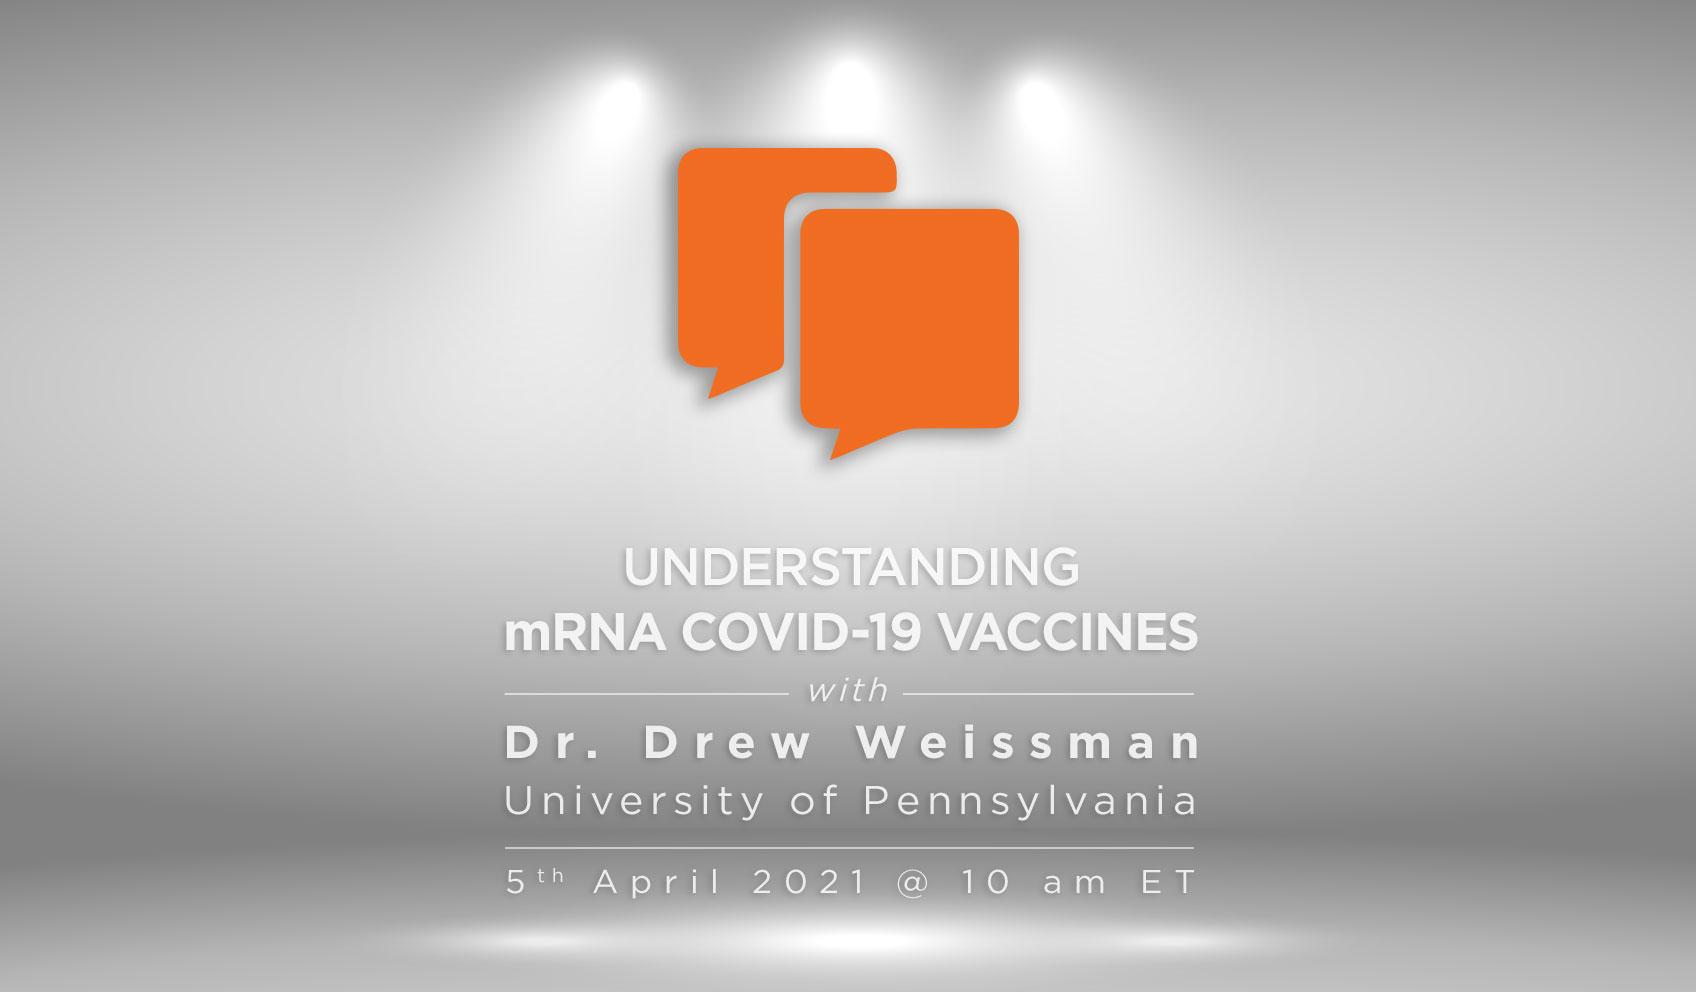 Understanding mRNA Covid-19 Vaccines